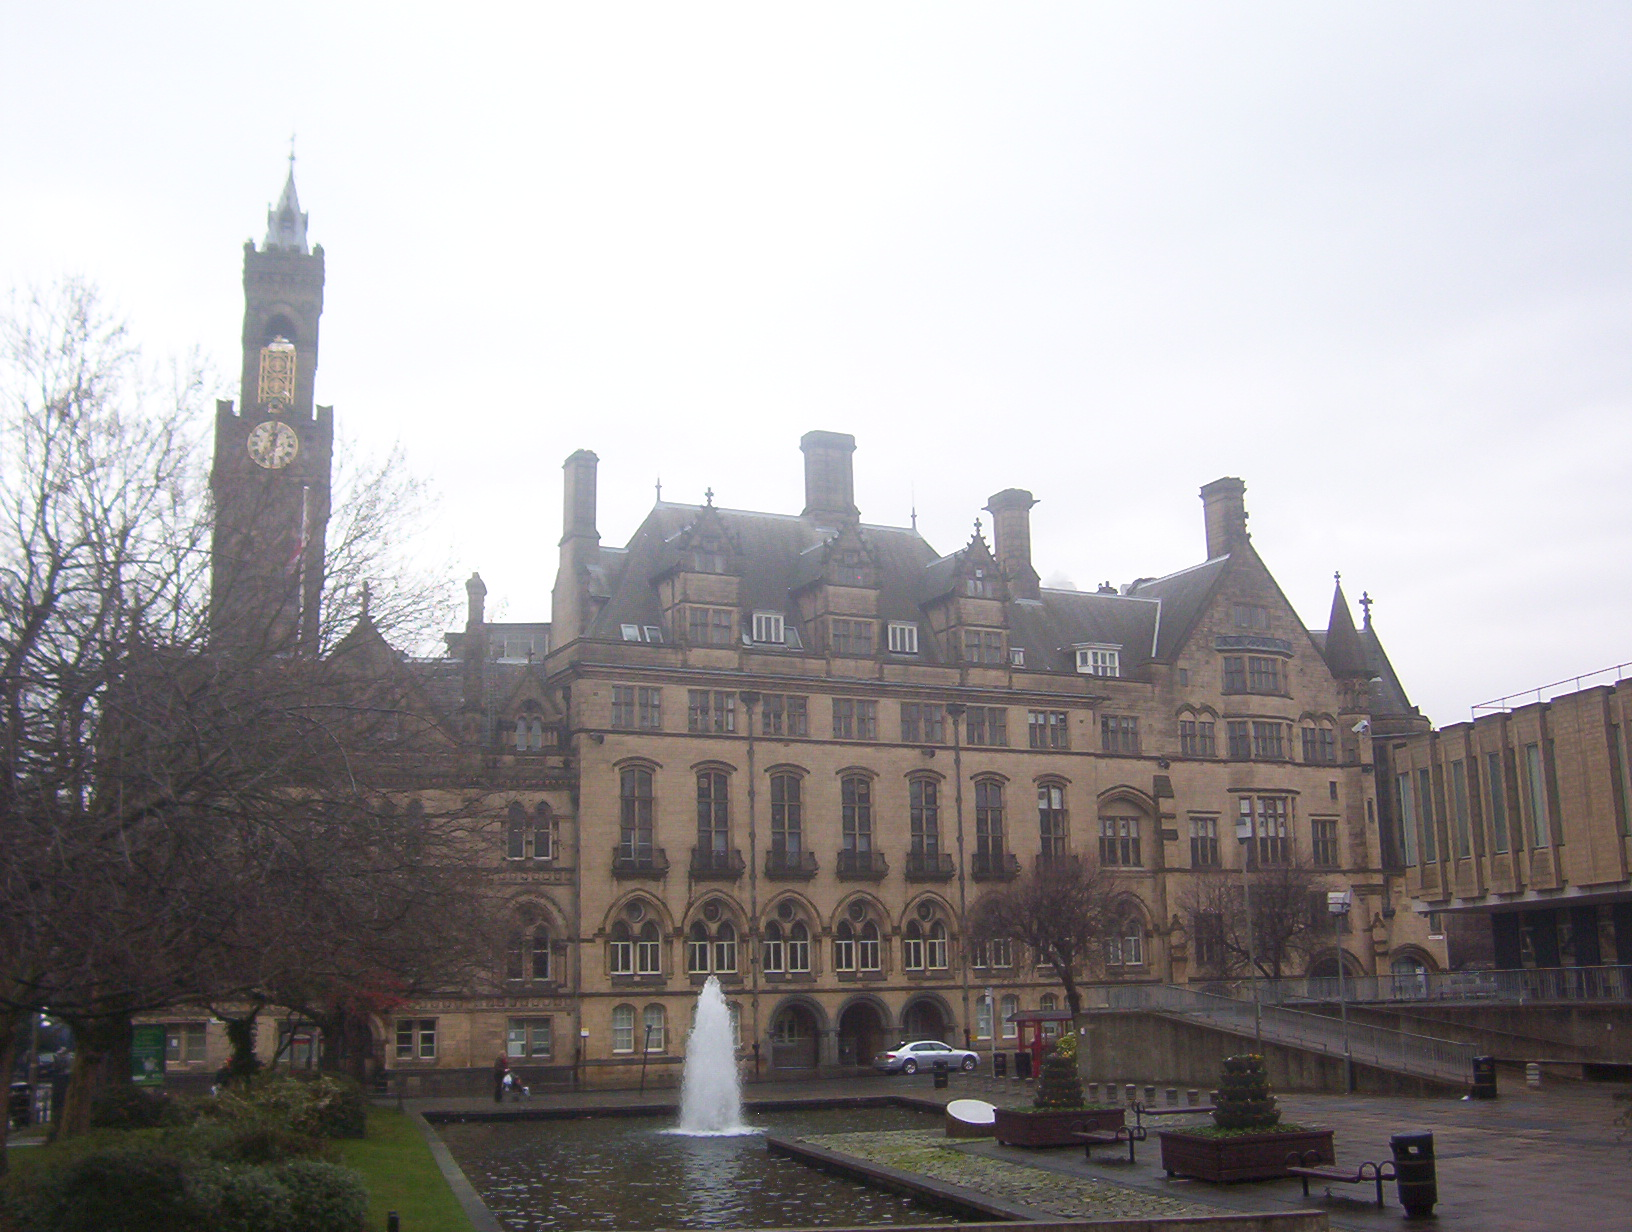 File:Bradford City Hall.jpg - Wikimedia Commons